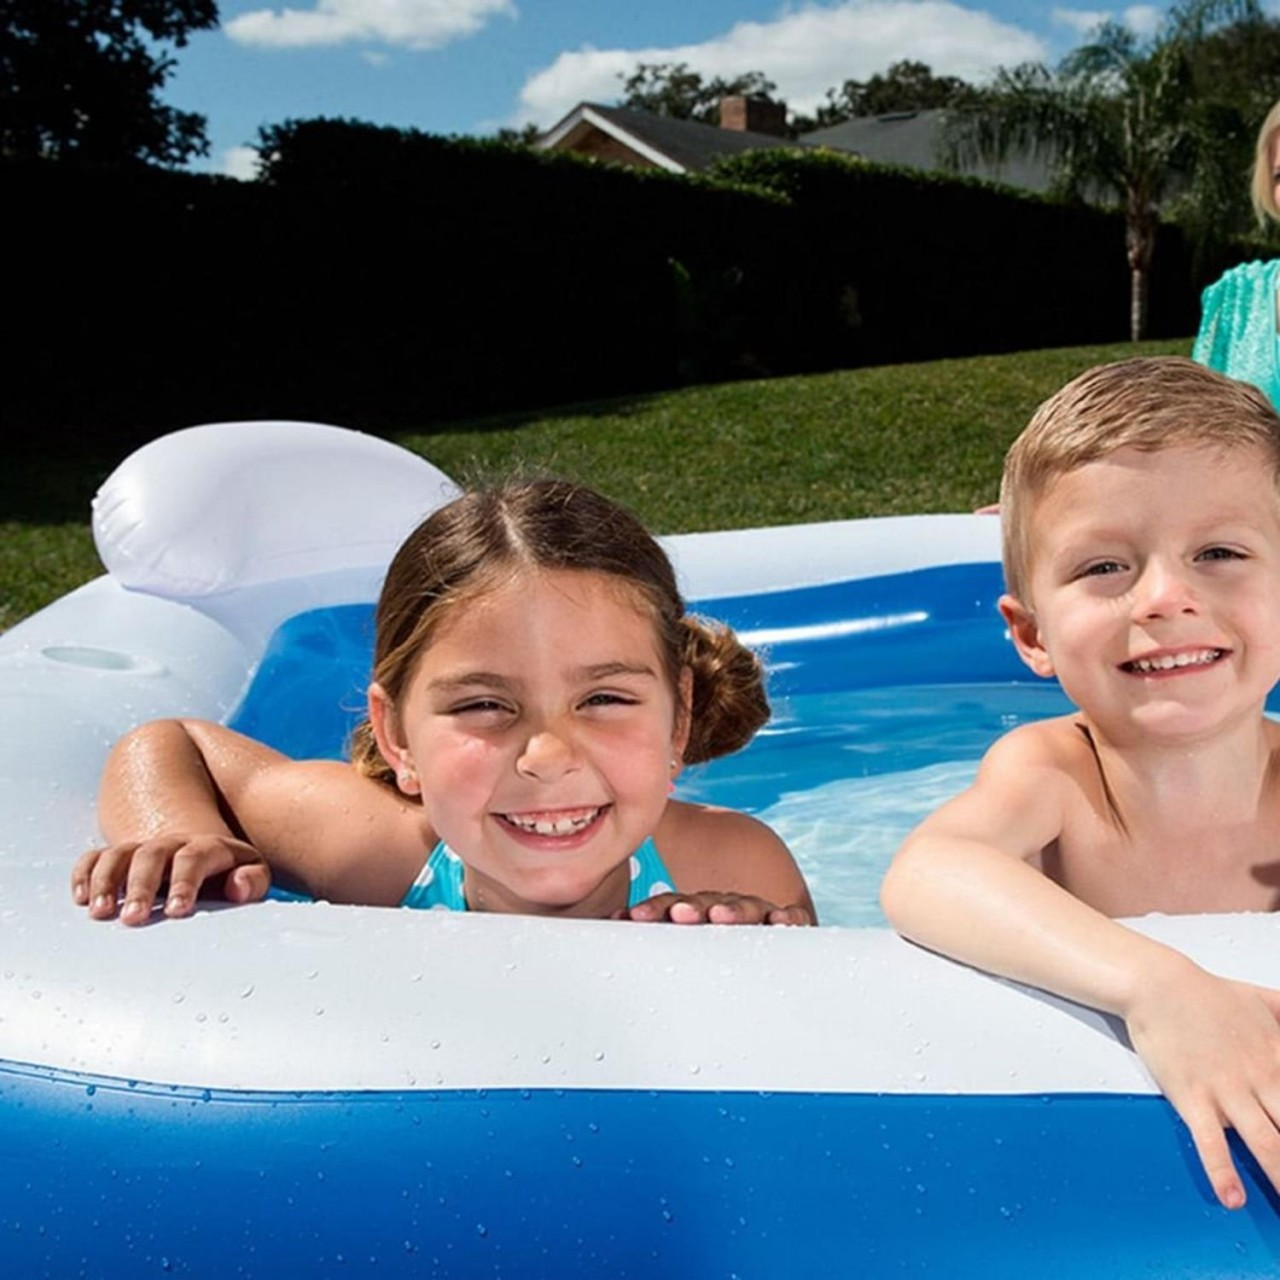 Bestway Planschbecken Schwimmbecken Swimmingpool Kinderpool Sitzecke 575 l 54153